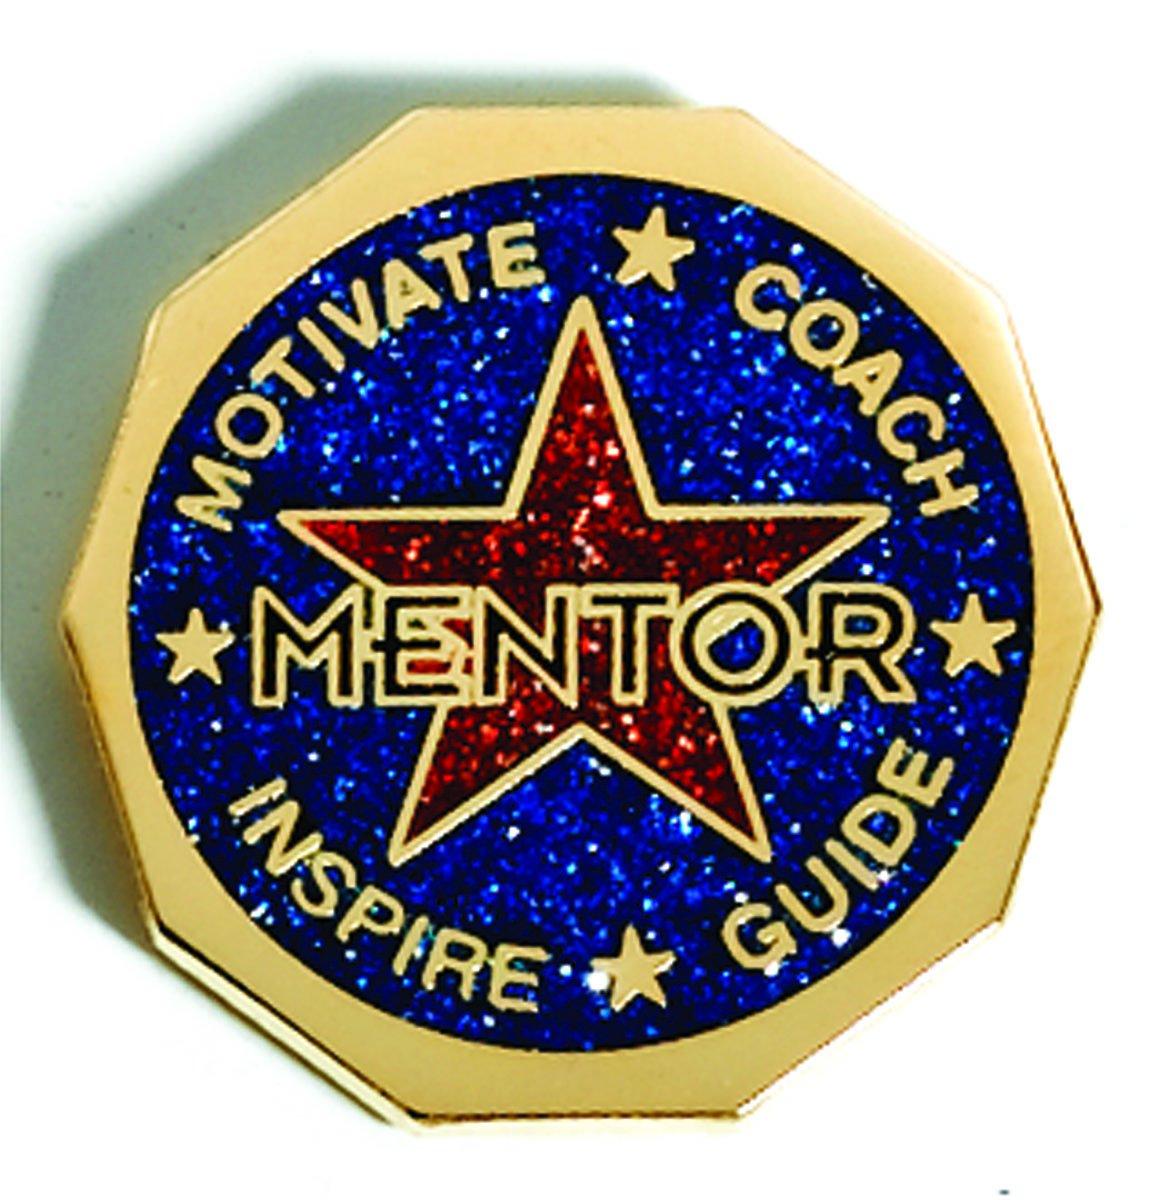 Mentor Blue and Red Glitter Appreciation Award Decagon Lapel Pins, 12 Pins